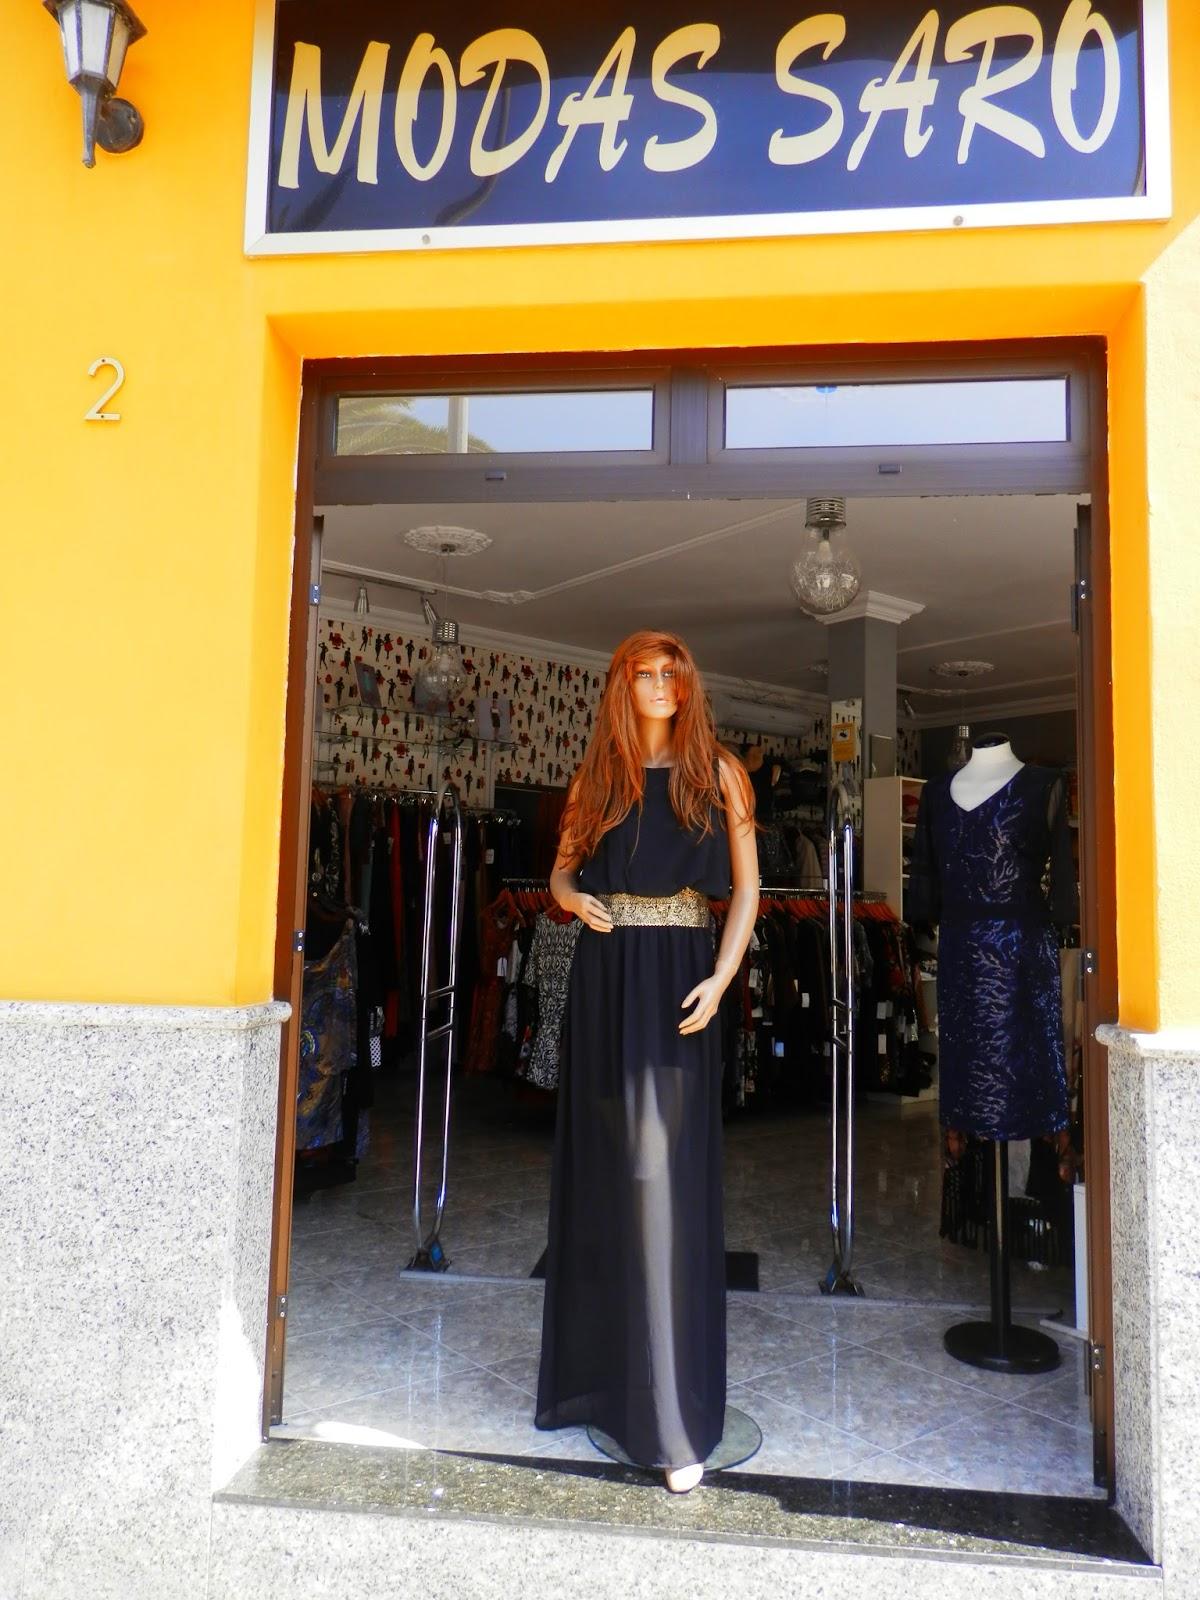 Lanzarote Granada C Arrecife Vestidos Fiesta Altavista Saro De Modas 2 kZPiXOu